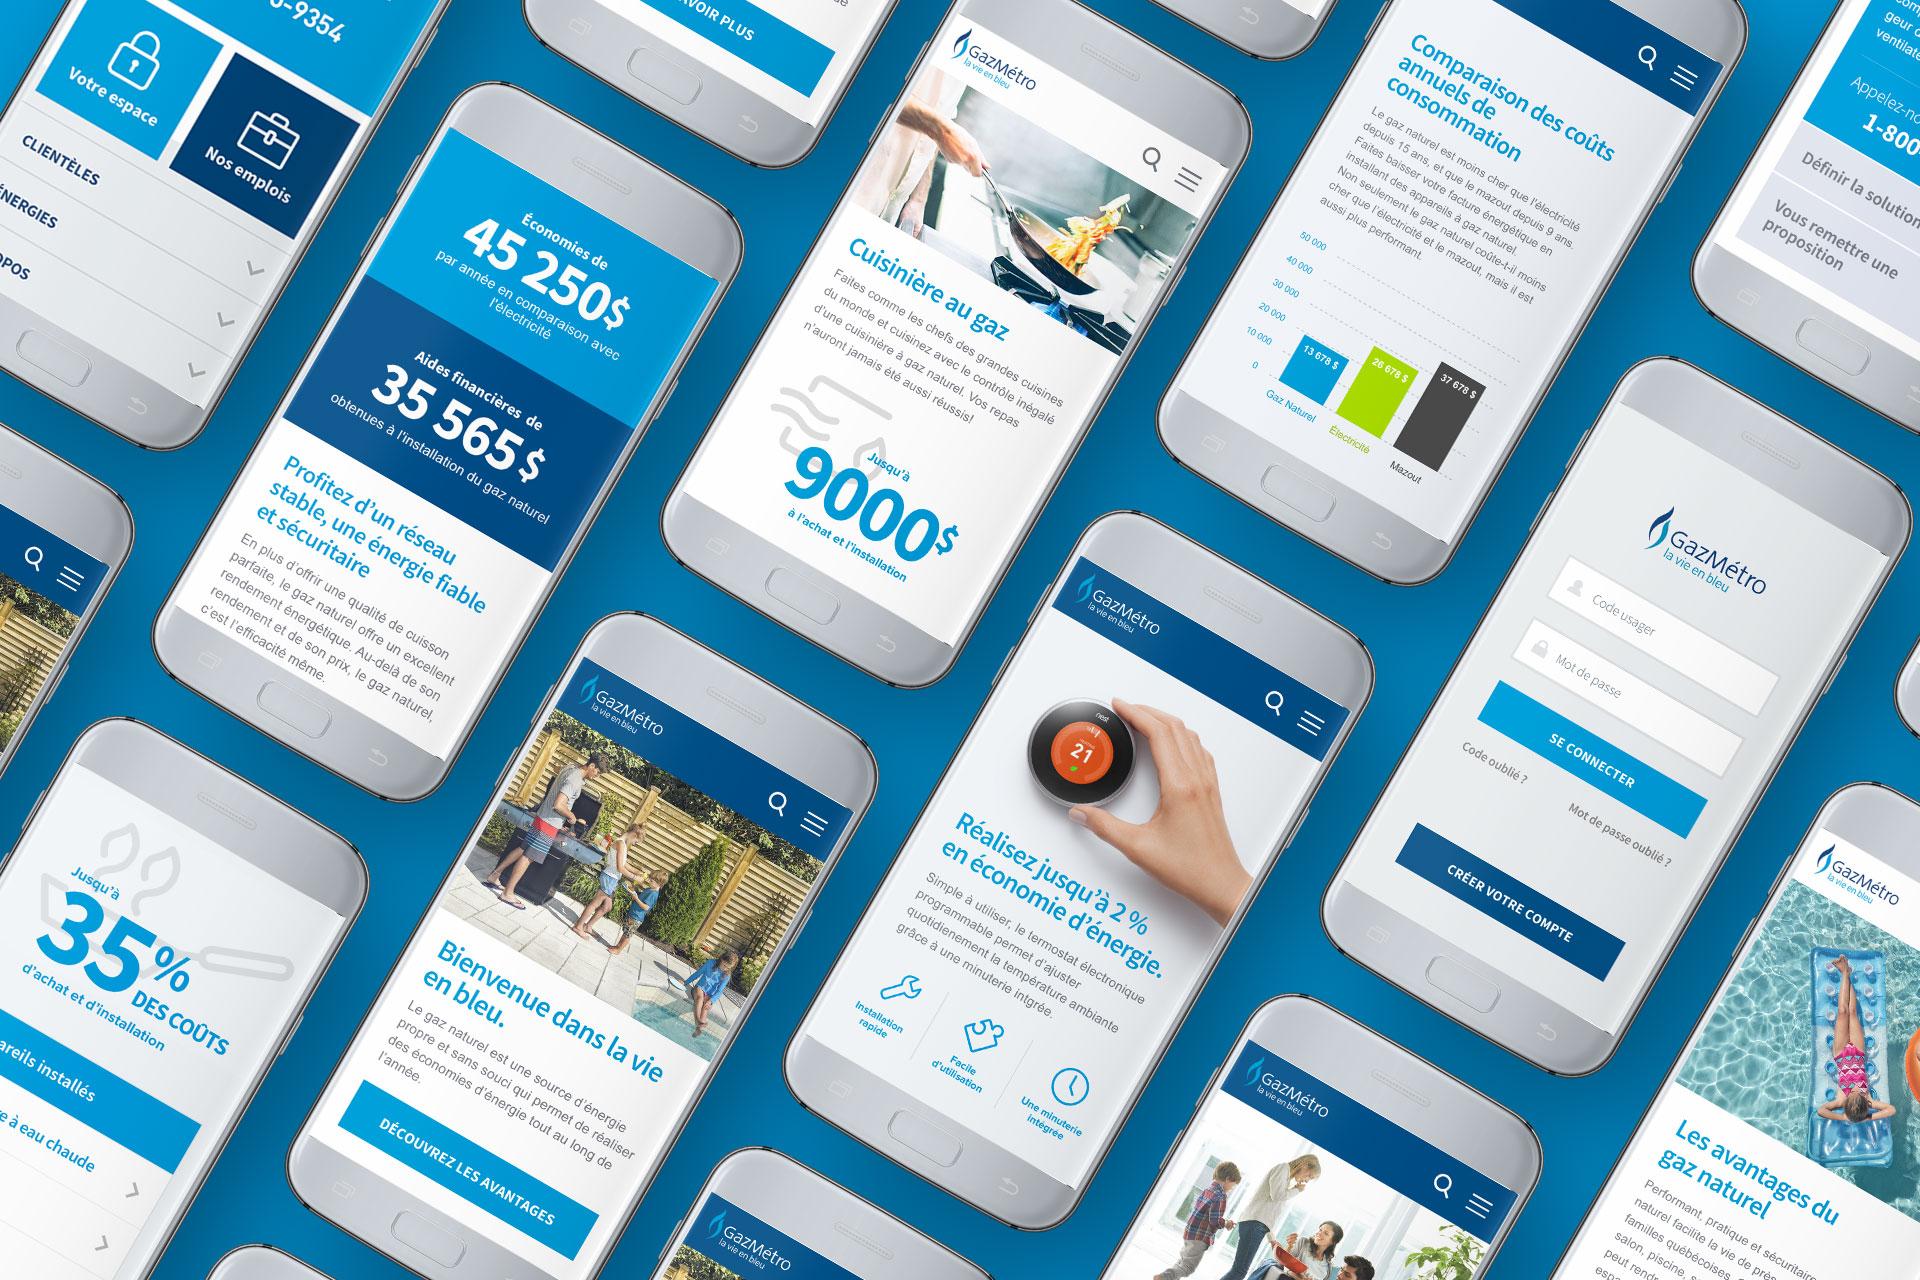 gazMetro_SamsungPhonesLayout